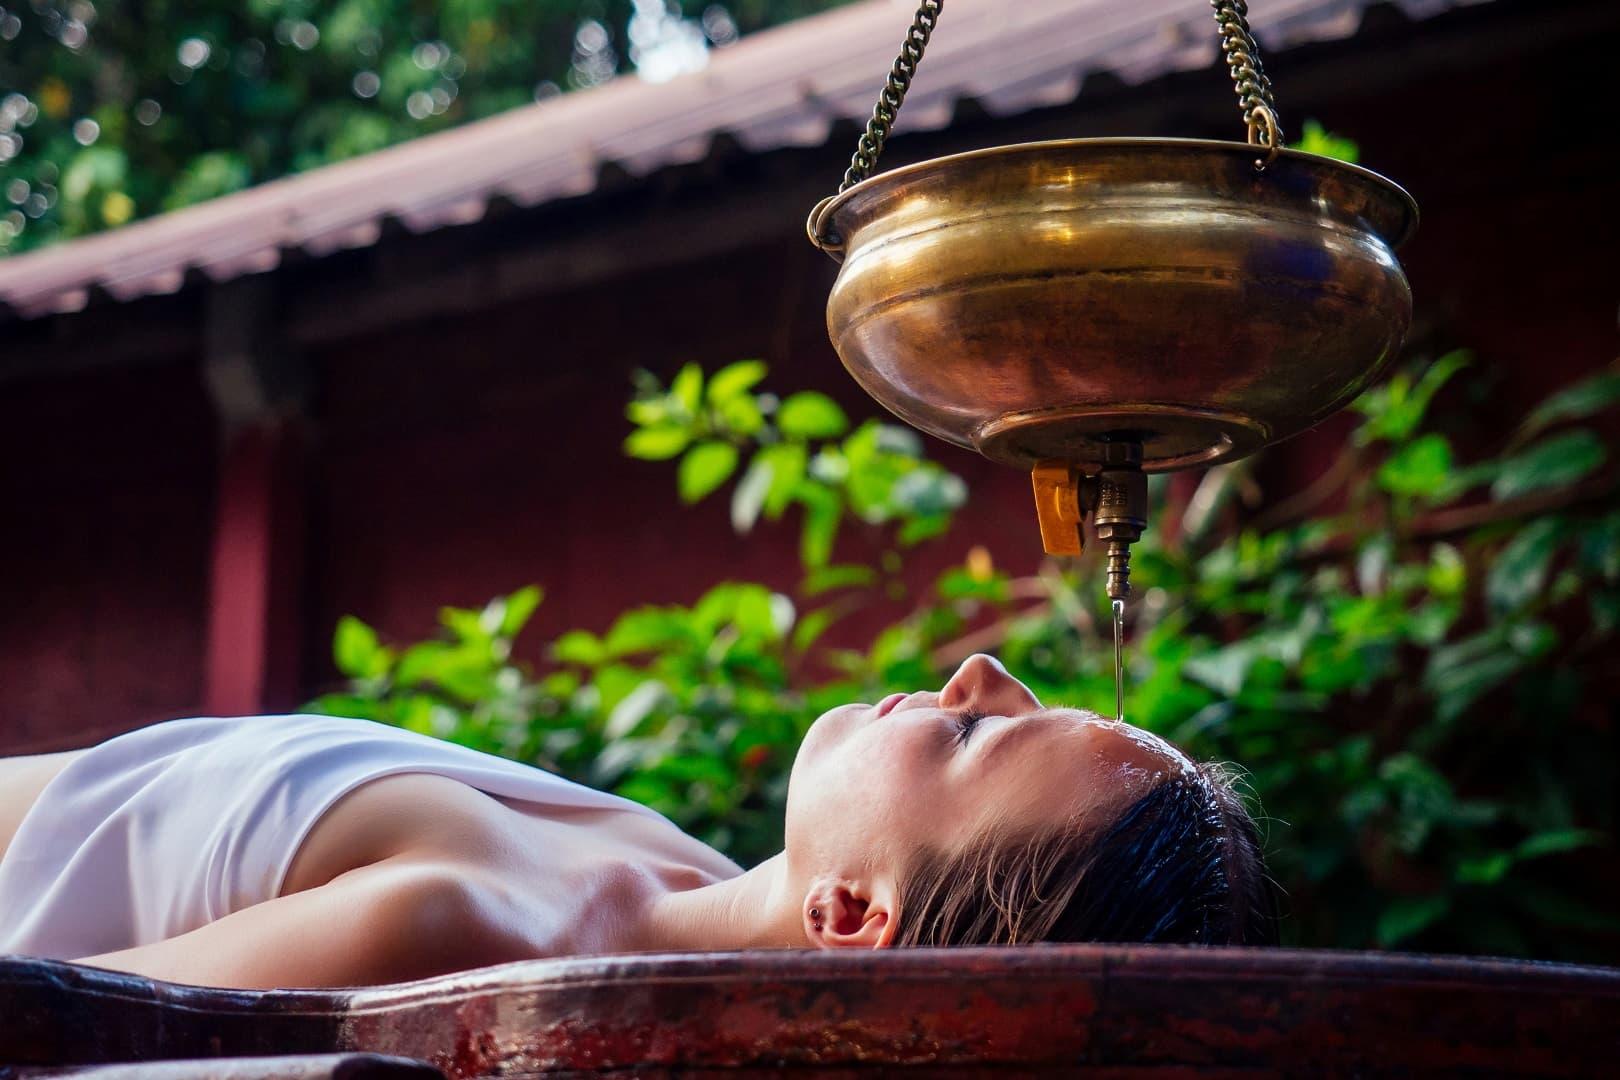 Ayurveda as complementary medicine